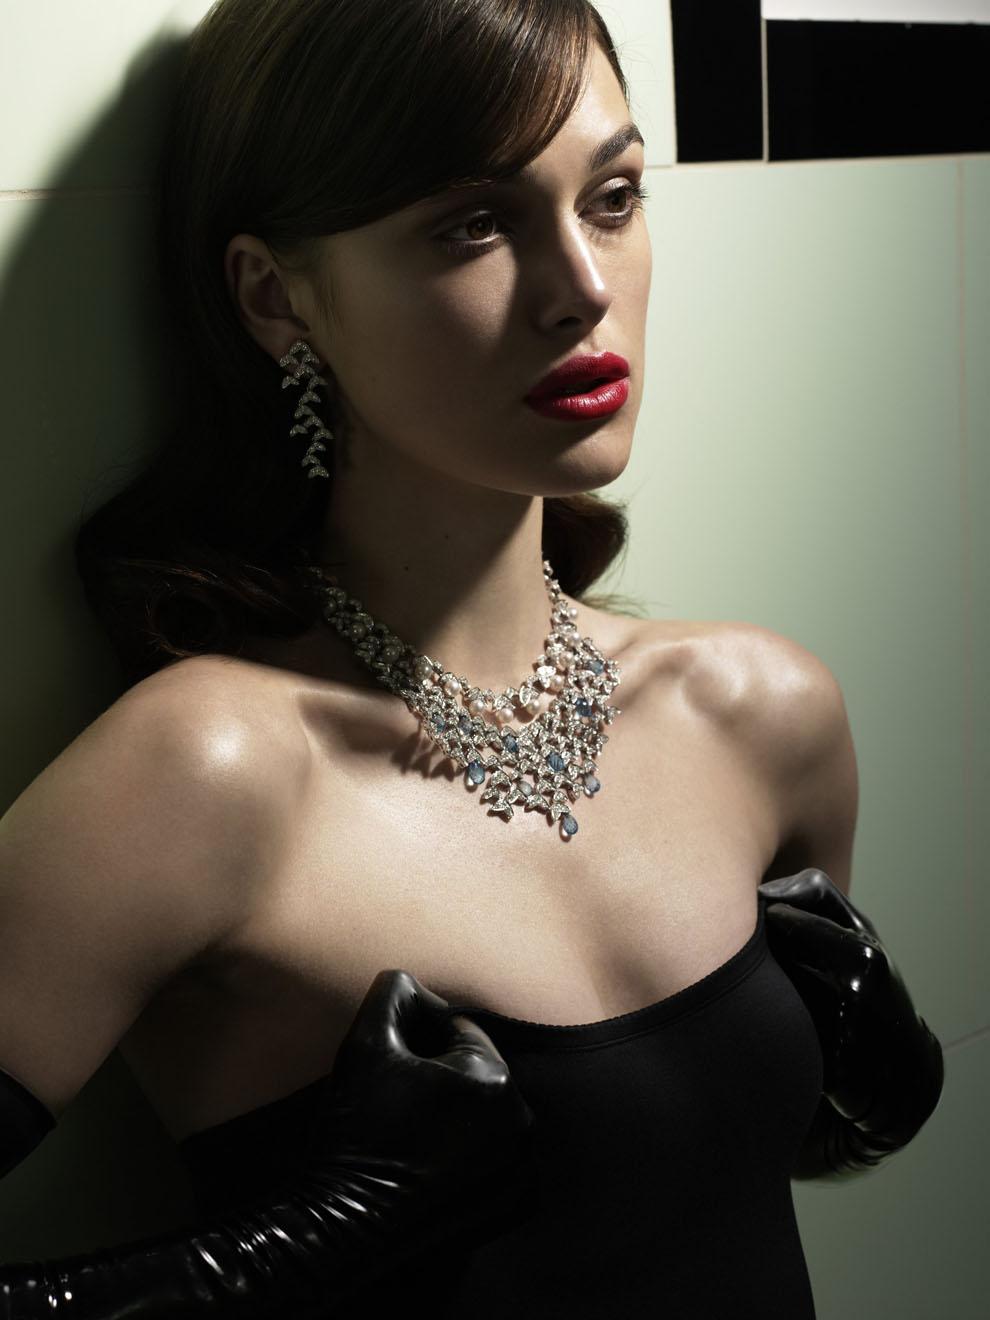 Keira Knightley  Esquire Photoshoot  Sweet Celebrity-7917